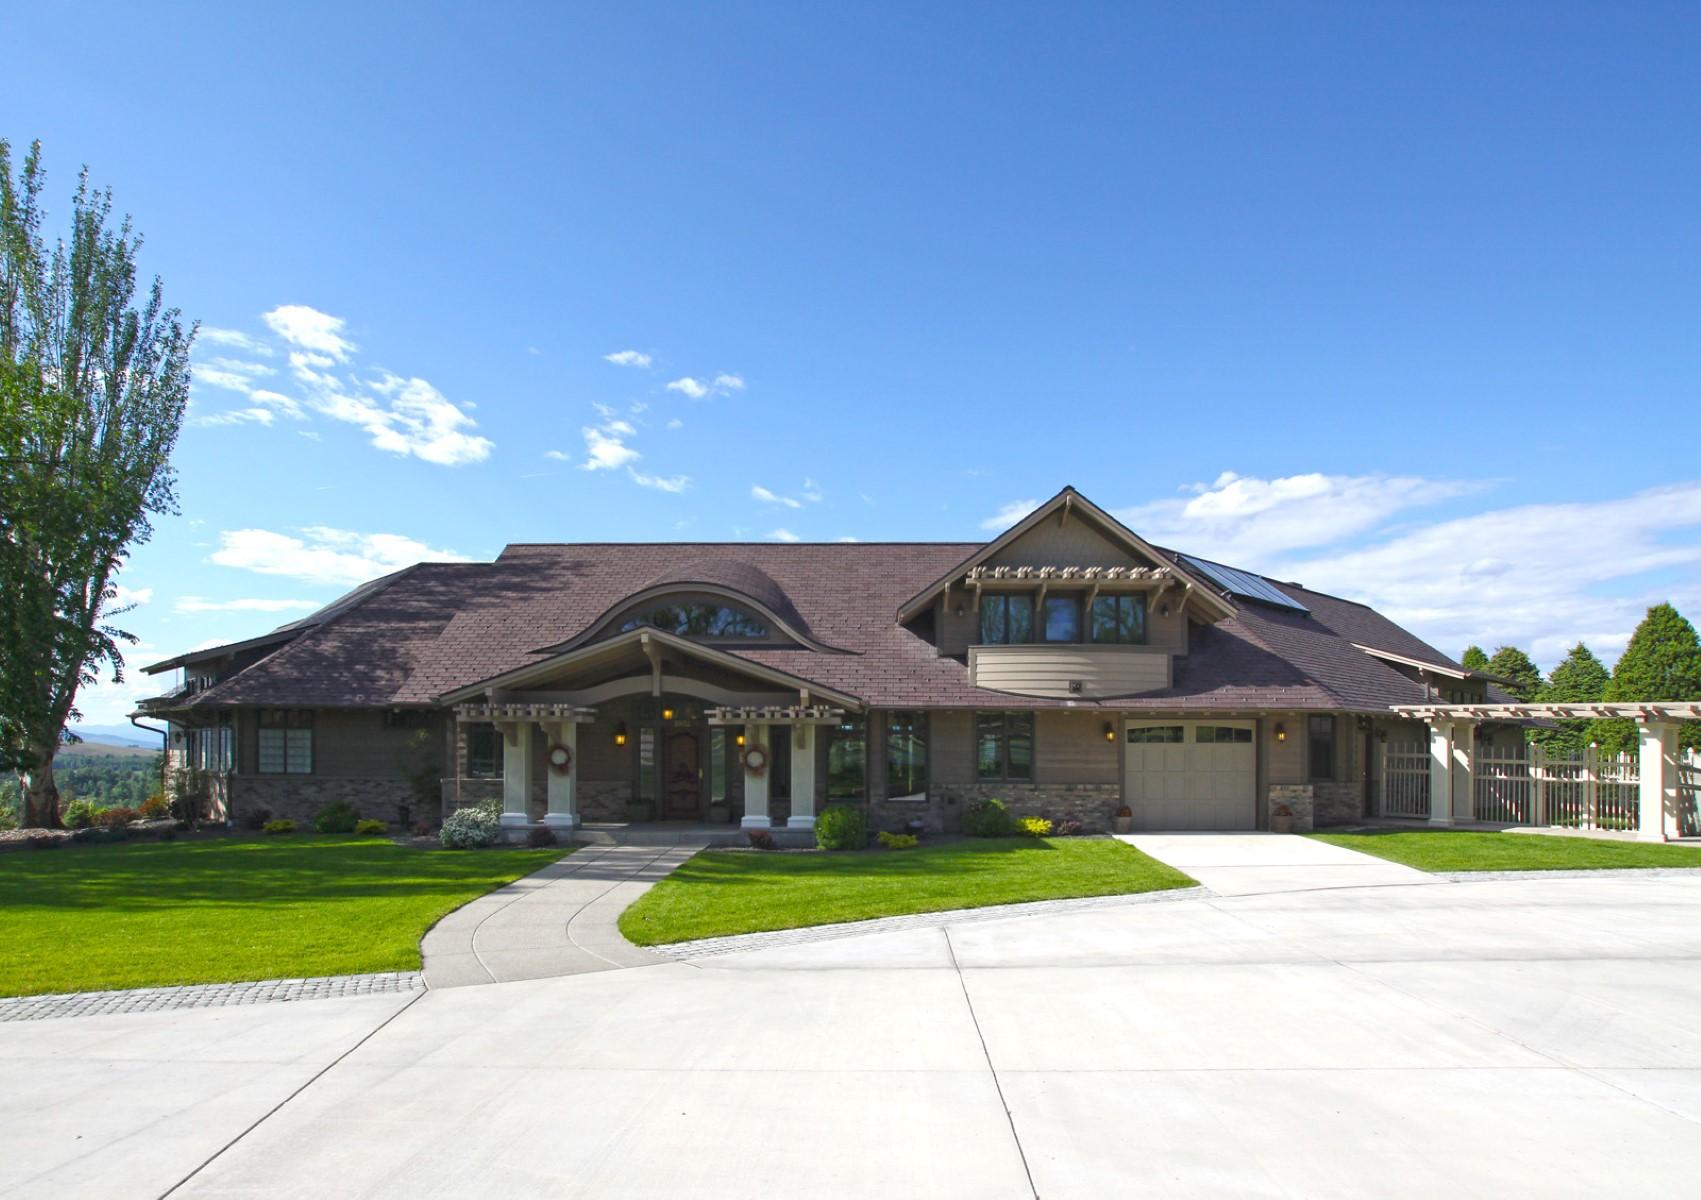 Casa Unifamiliar por un Venta en 2932 Starlight Drive 2932 Starlight Drive Missoula, Montana, 59803 Estados Unidos